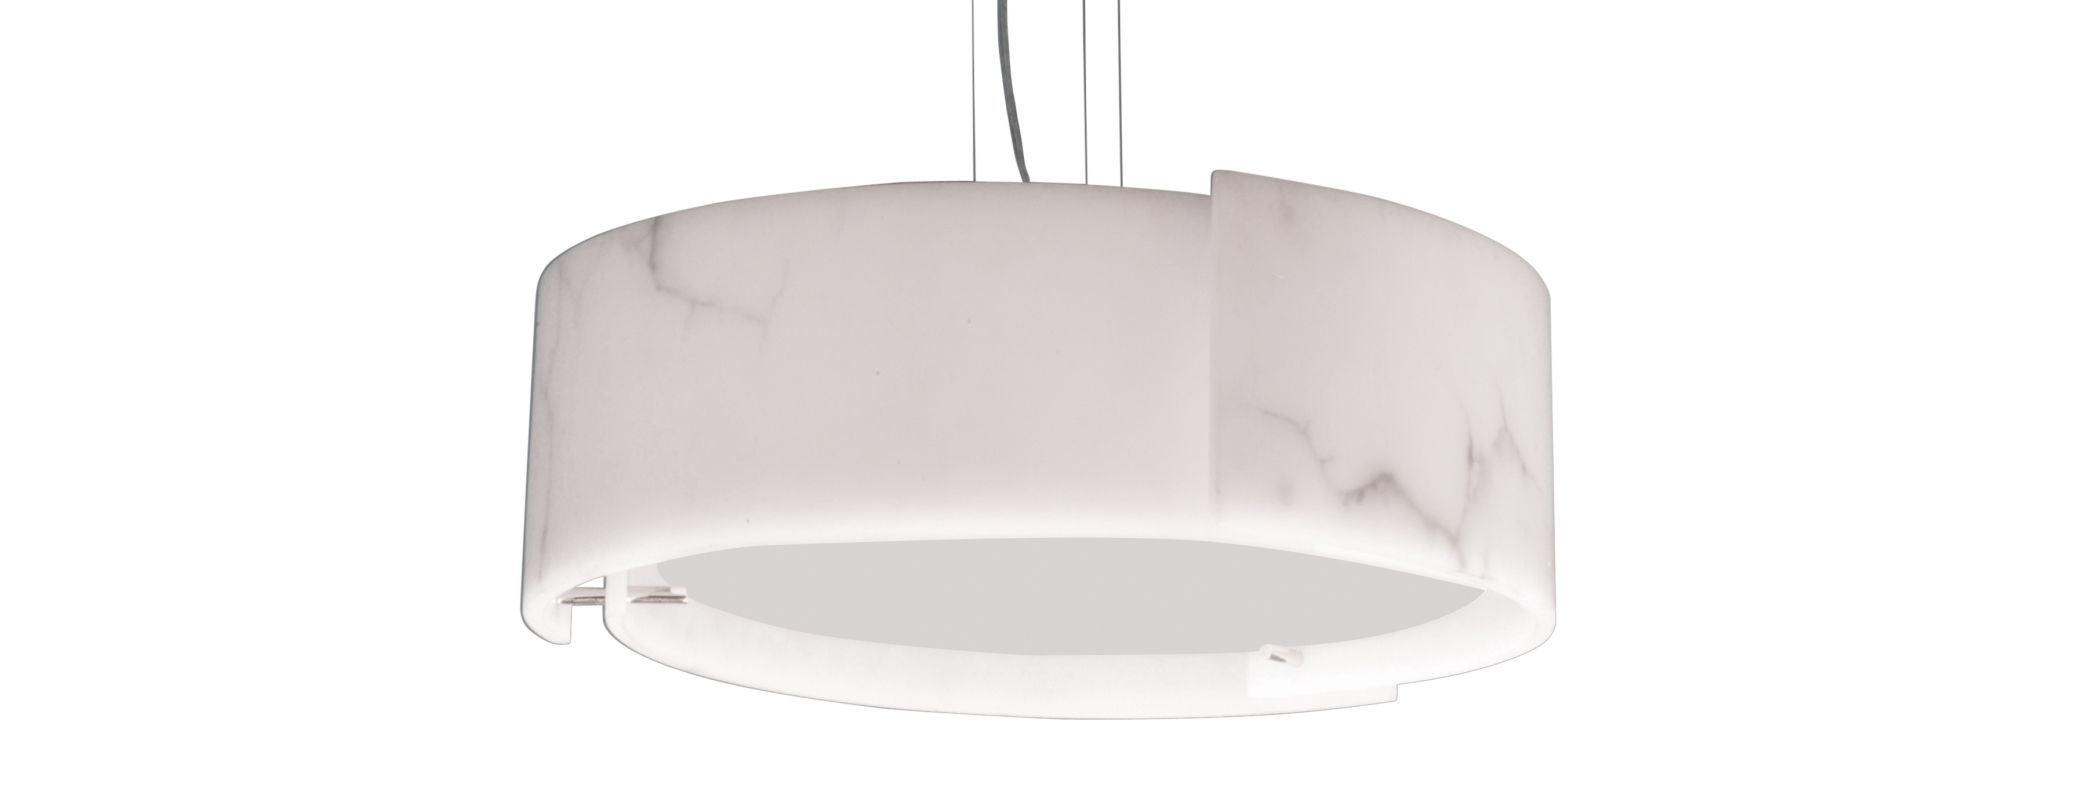 Eurofase Lighting 12530-014 Chrome Contemporary Dervish Pendant